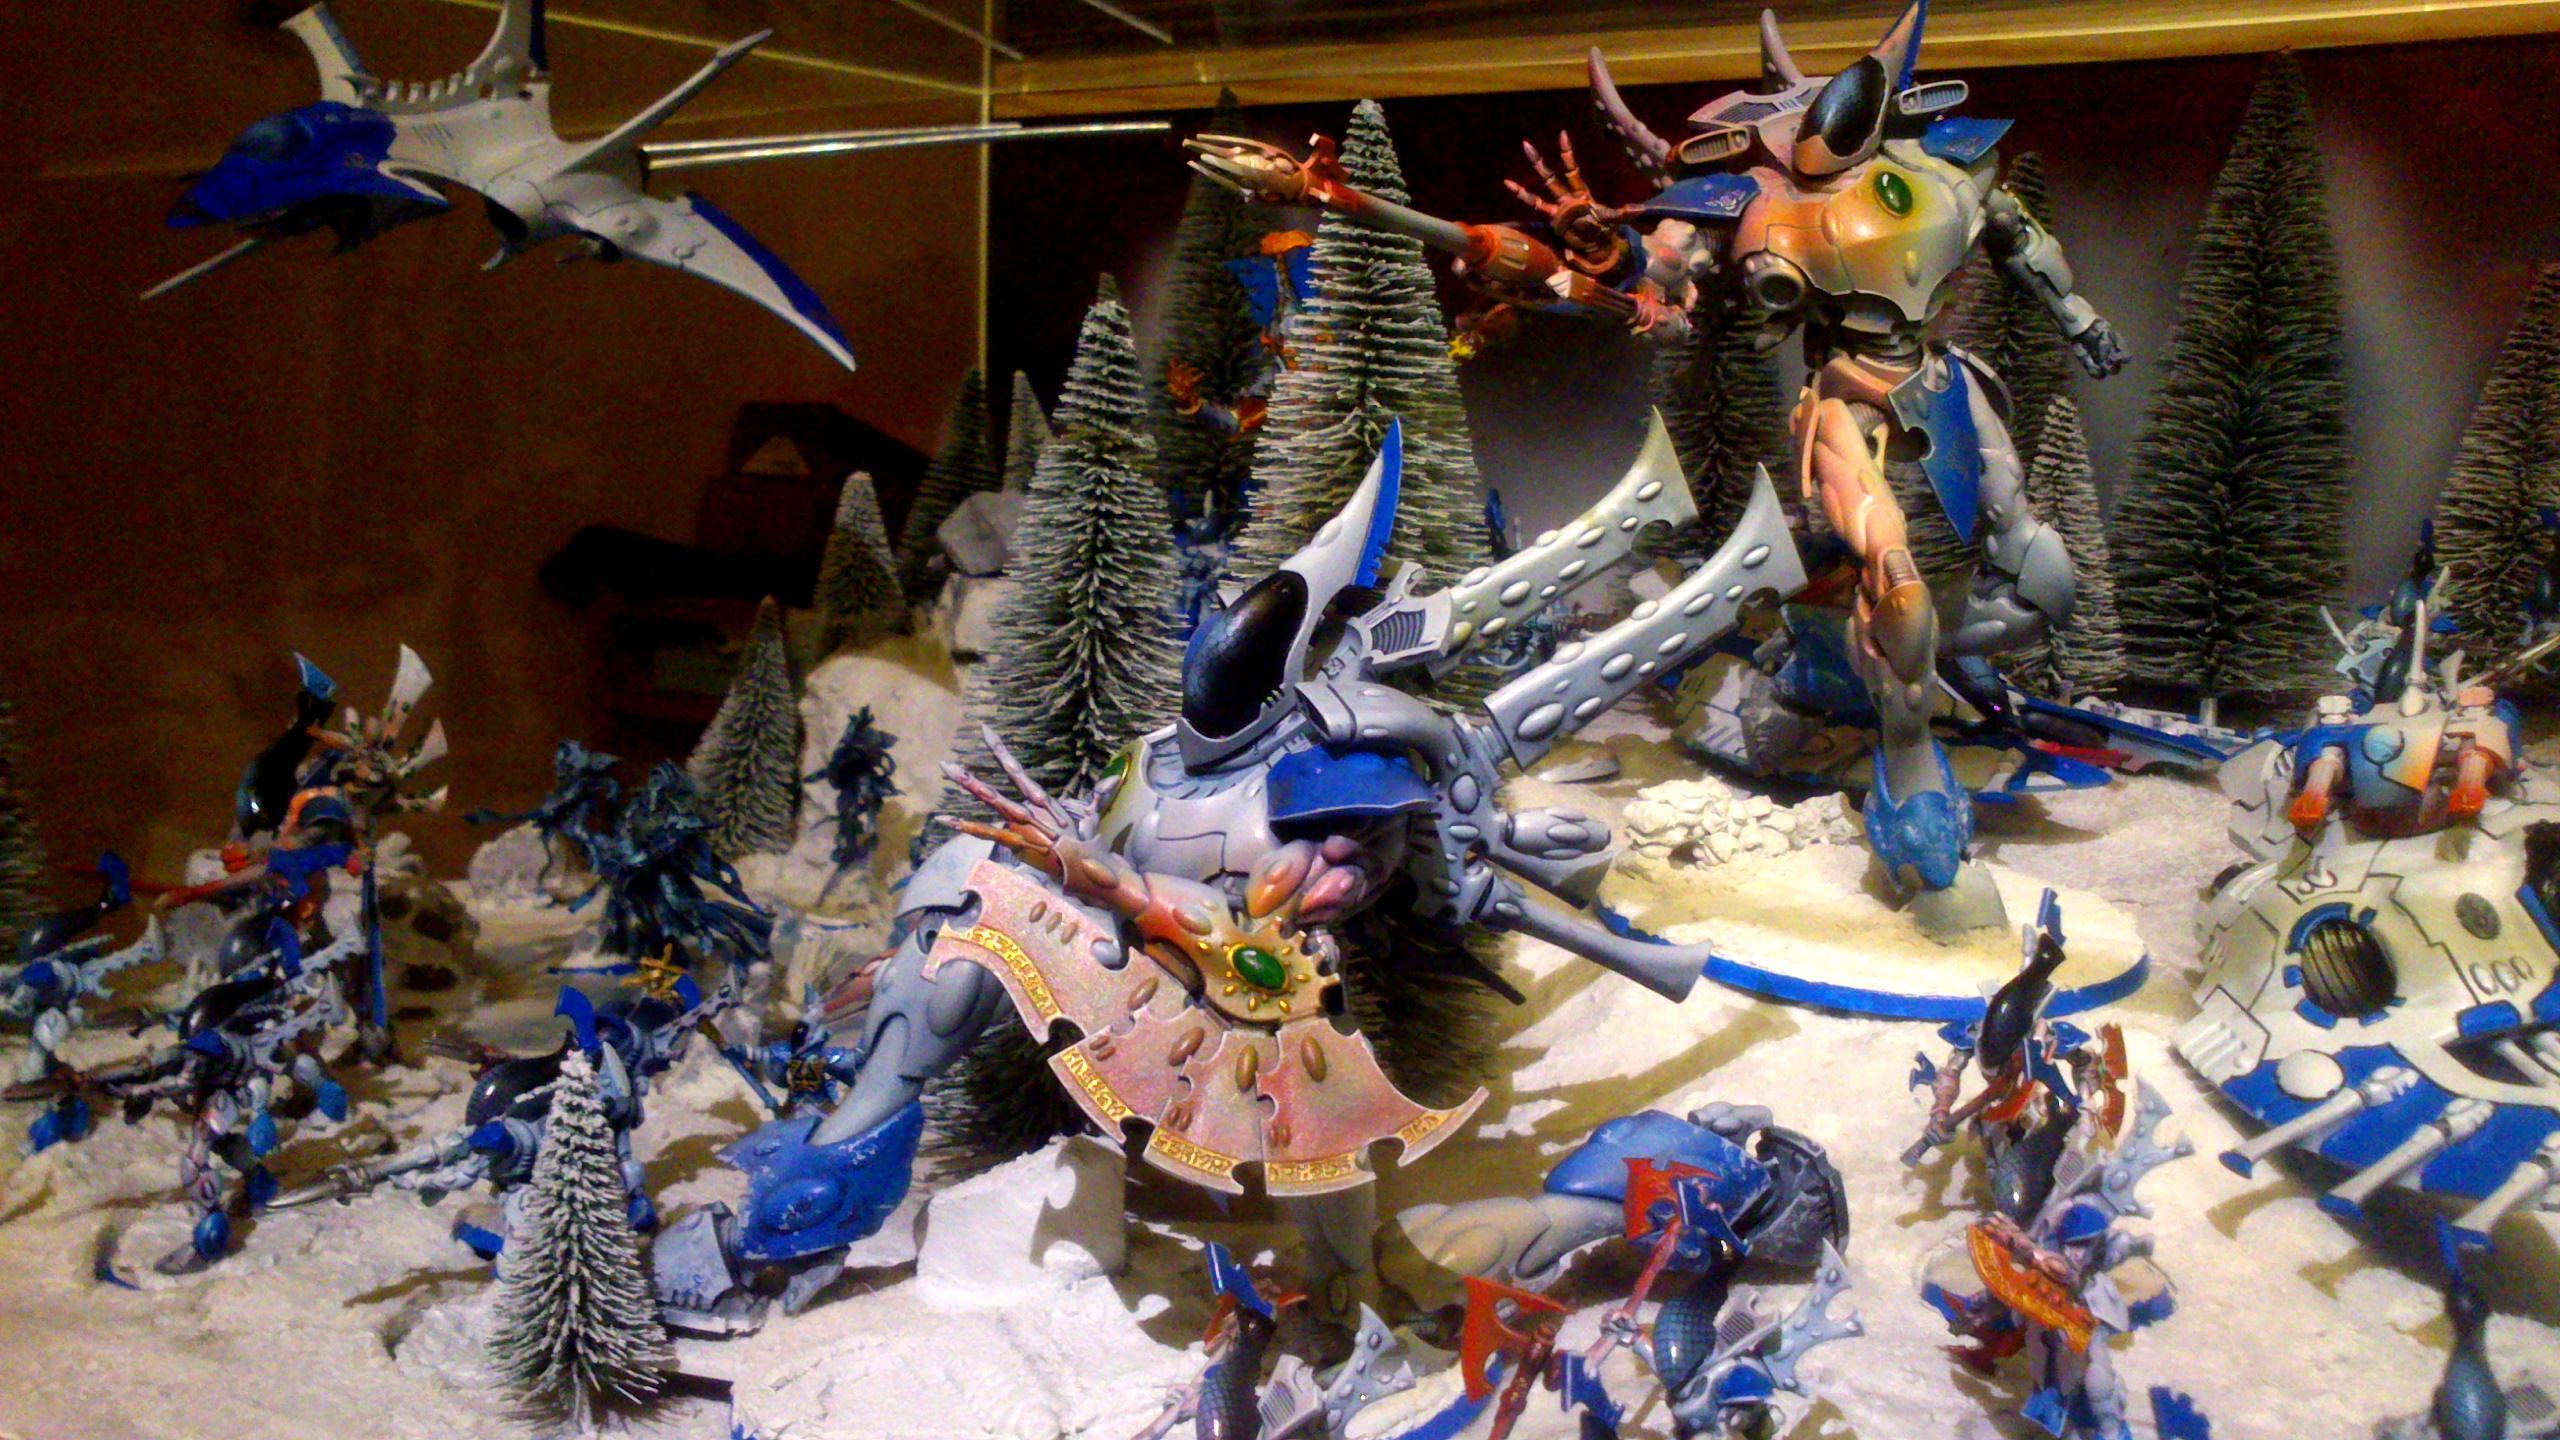 Army, Blue White, Diorama, Eldar, Eldar Wraith Army, Forest, Host, Iyanden, Iybraesil, Iybraezil, Snow, Spirit, Spirit Host, Spirit Only, Warhammer 40,000, Warhammer Fantasy, Winter, Wraith, Wraith Host, Wraith Only, Wraithguard, Wraithknight, Wraithknights